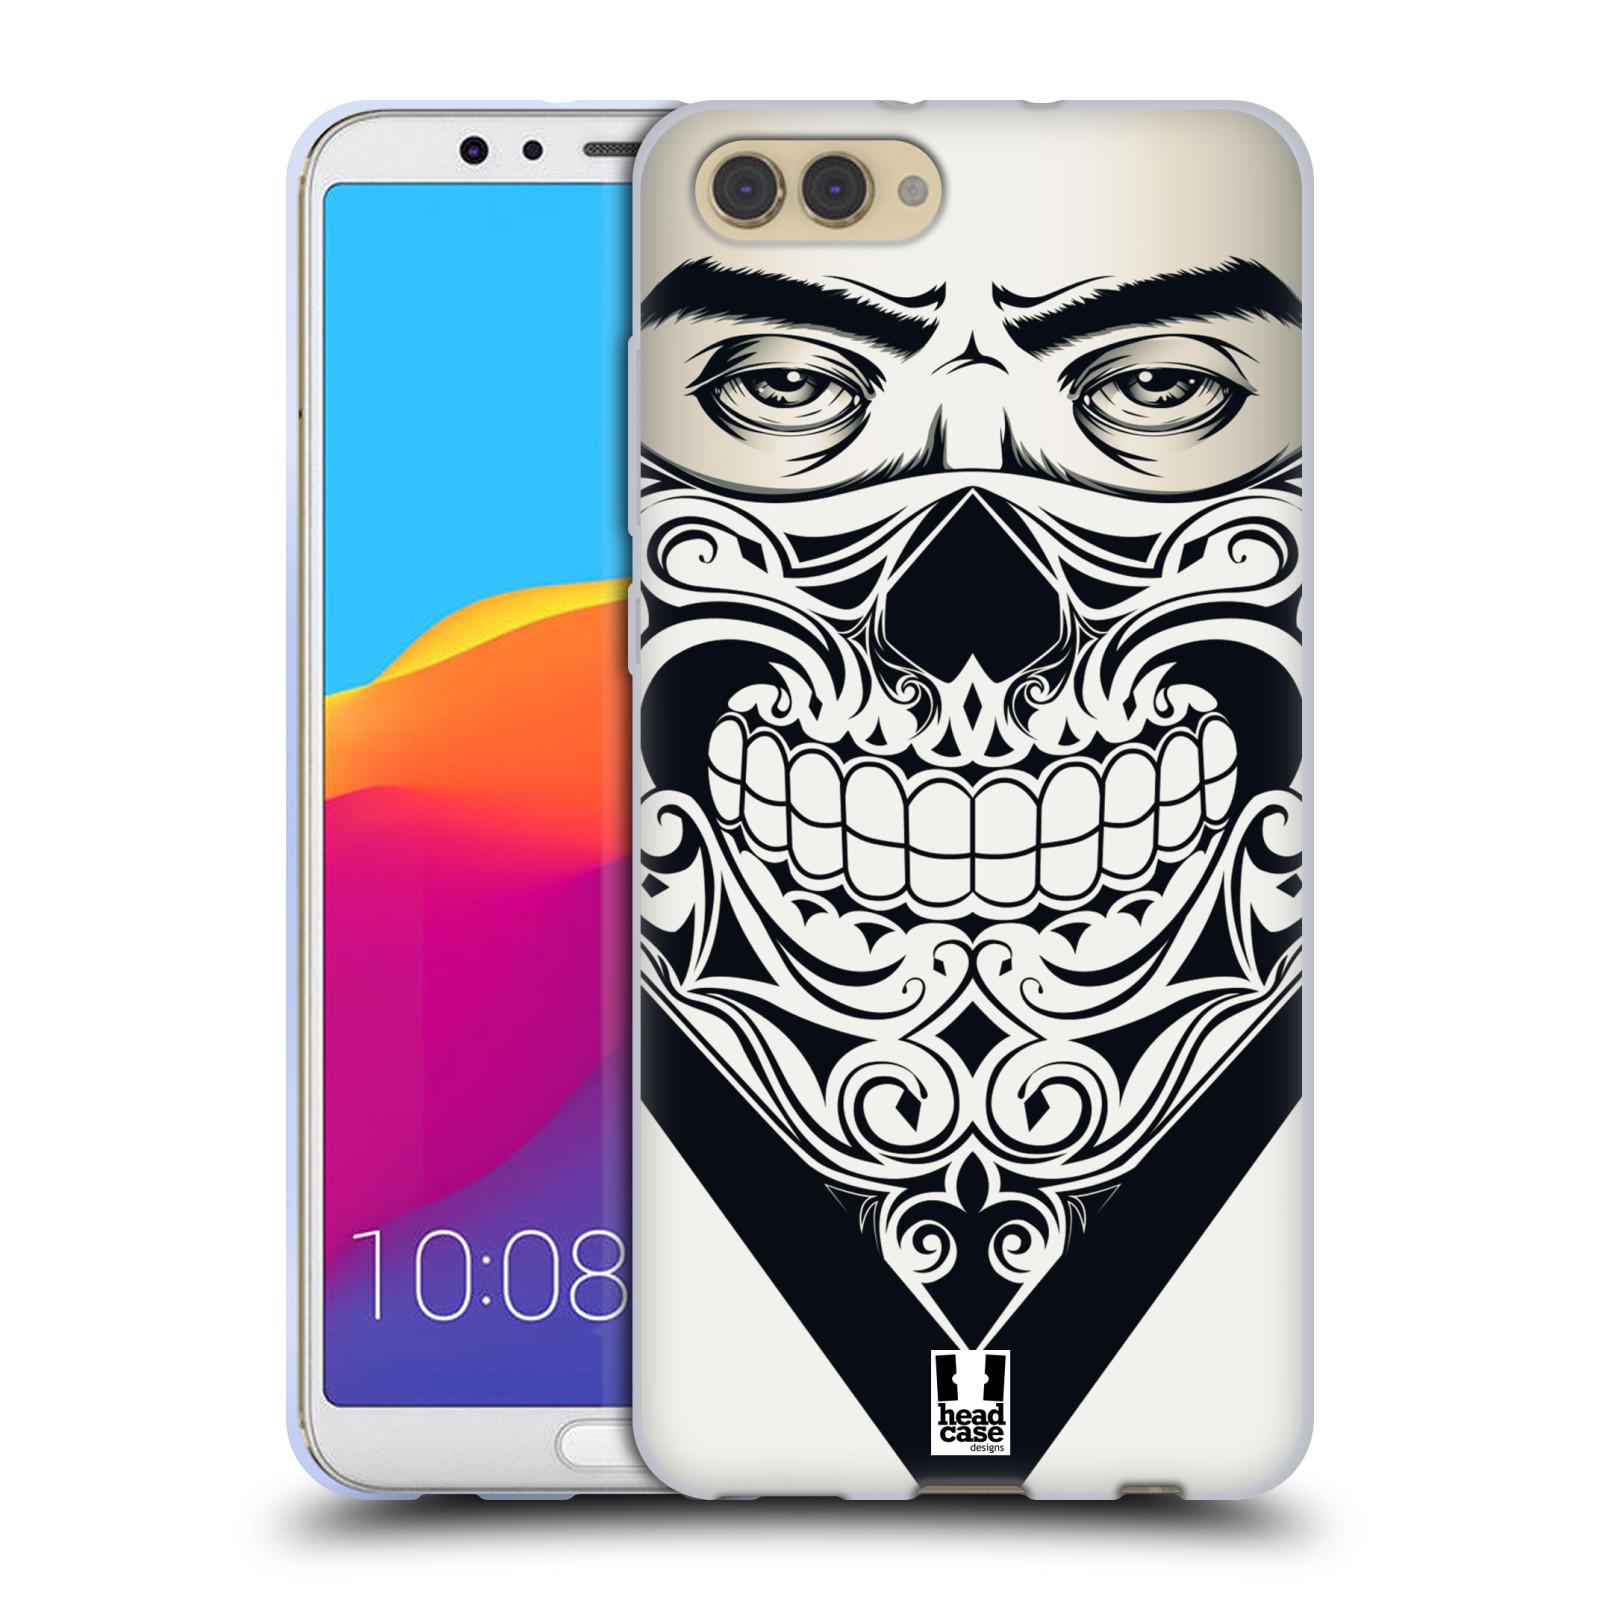 Silikonové pouzdro na mobil Honor View 10 - Head Case - LEBKA BANDANA